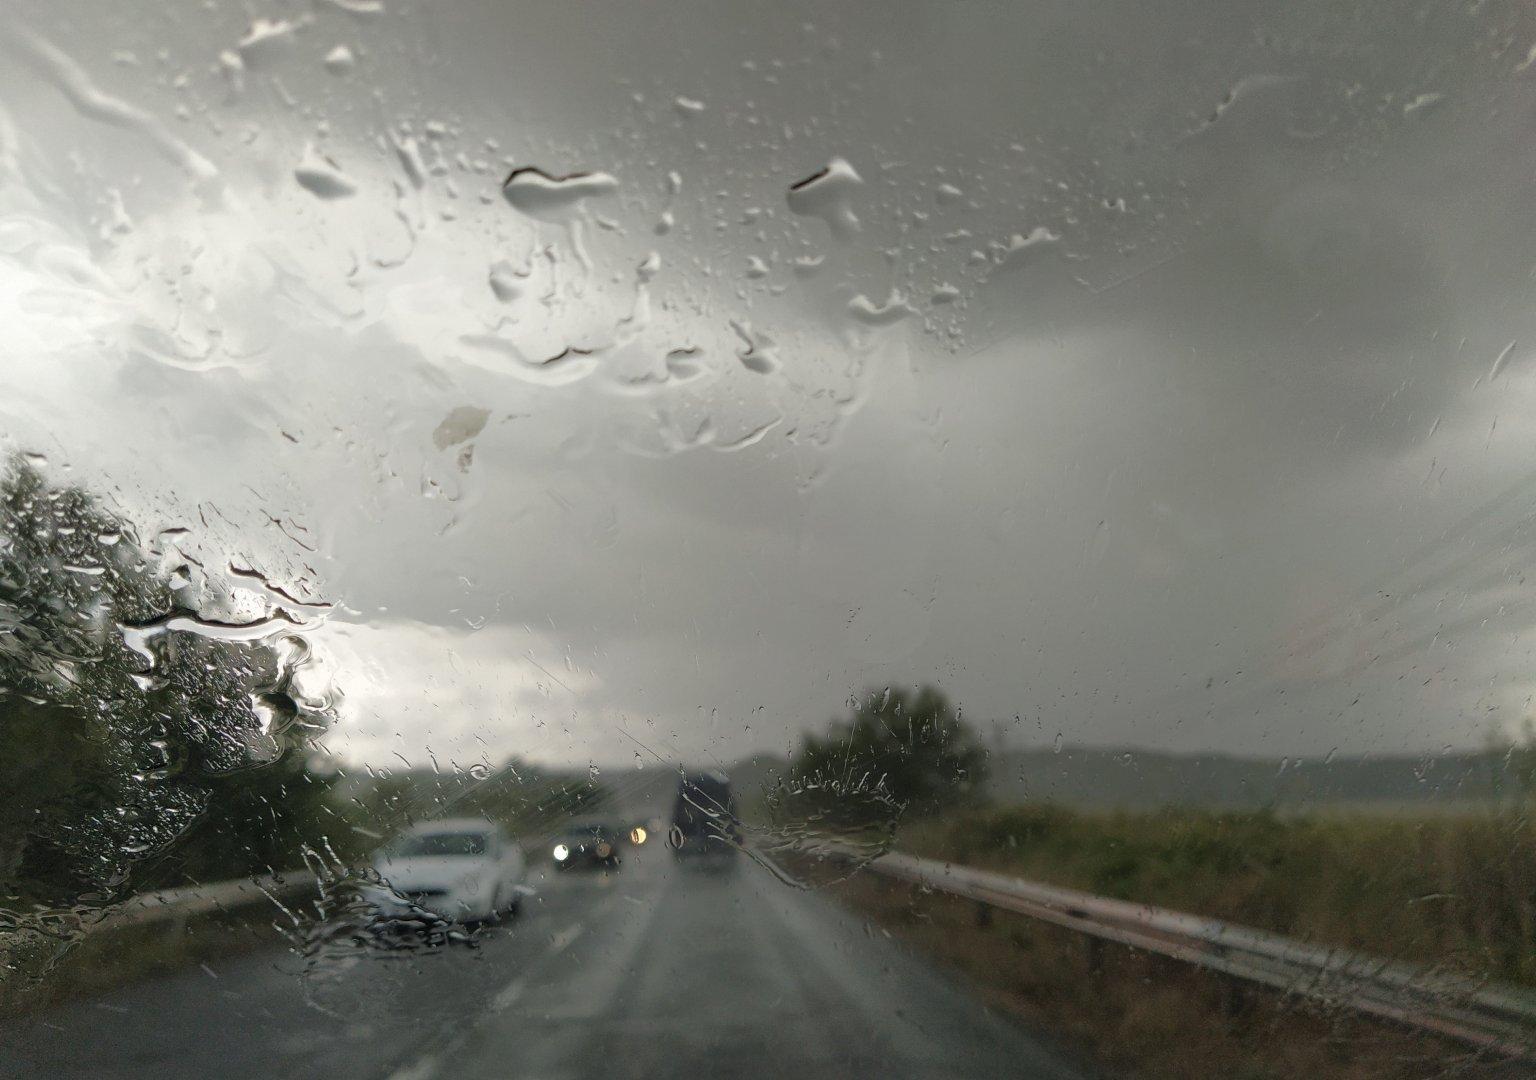 За броени минути обилен дъжд се изля над града